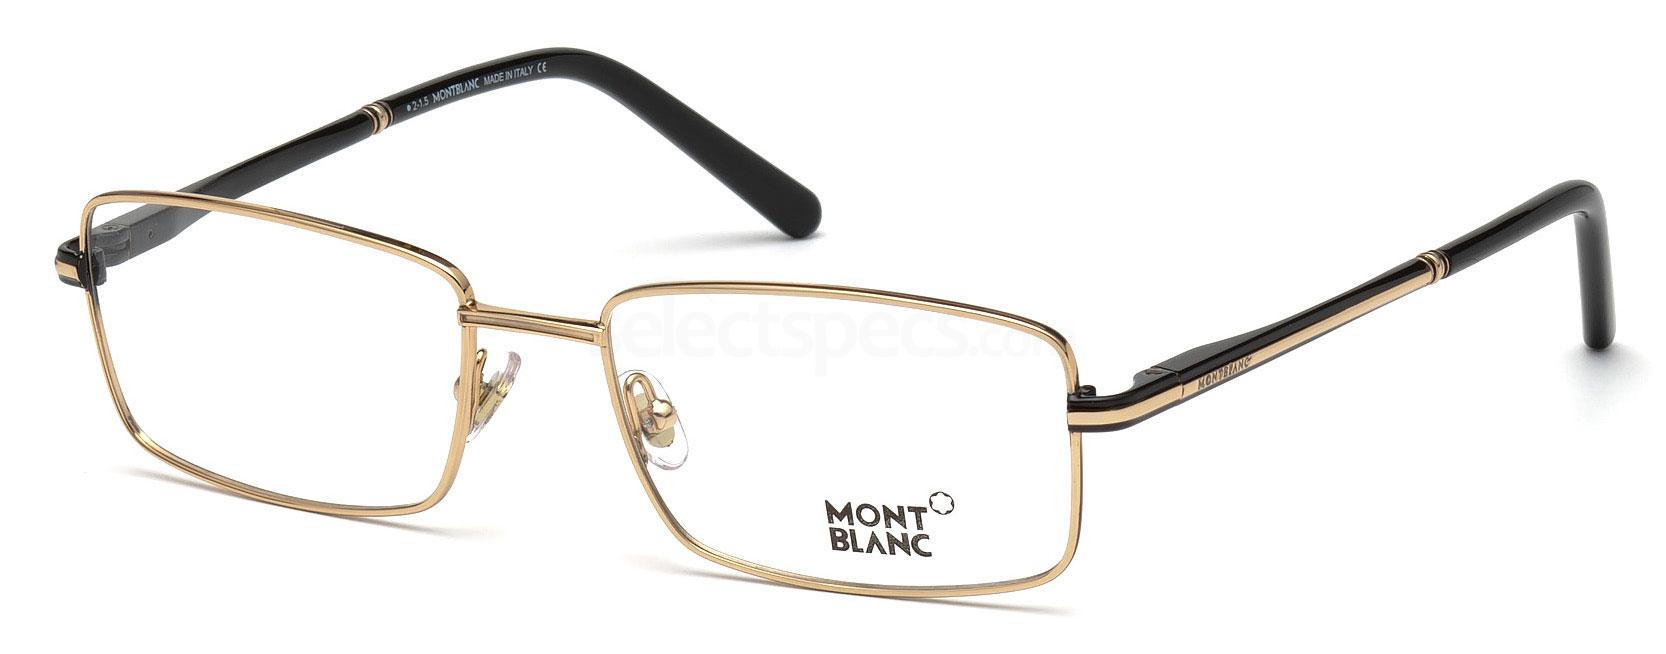 001 MB0578 Glasses, Mont Blanc